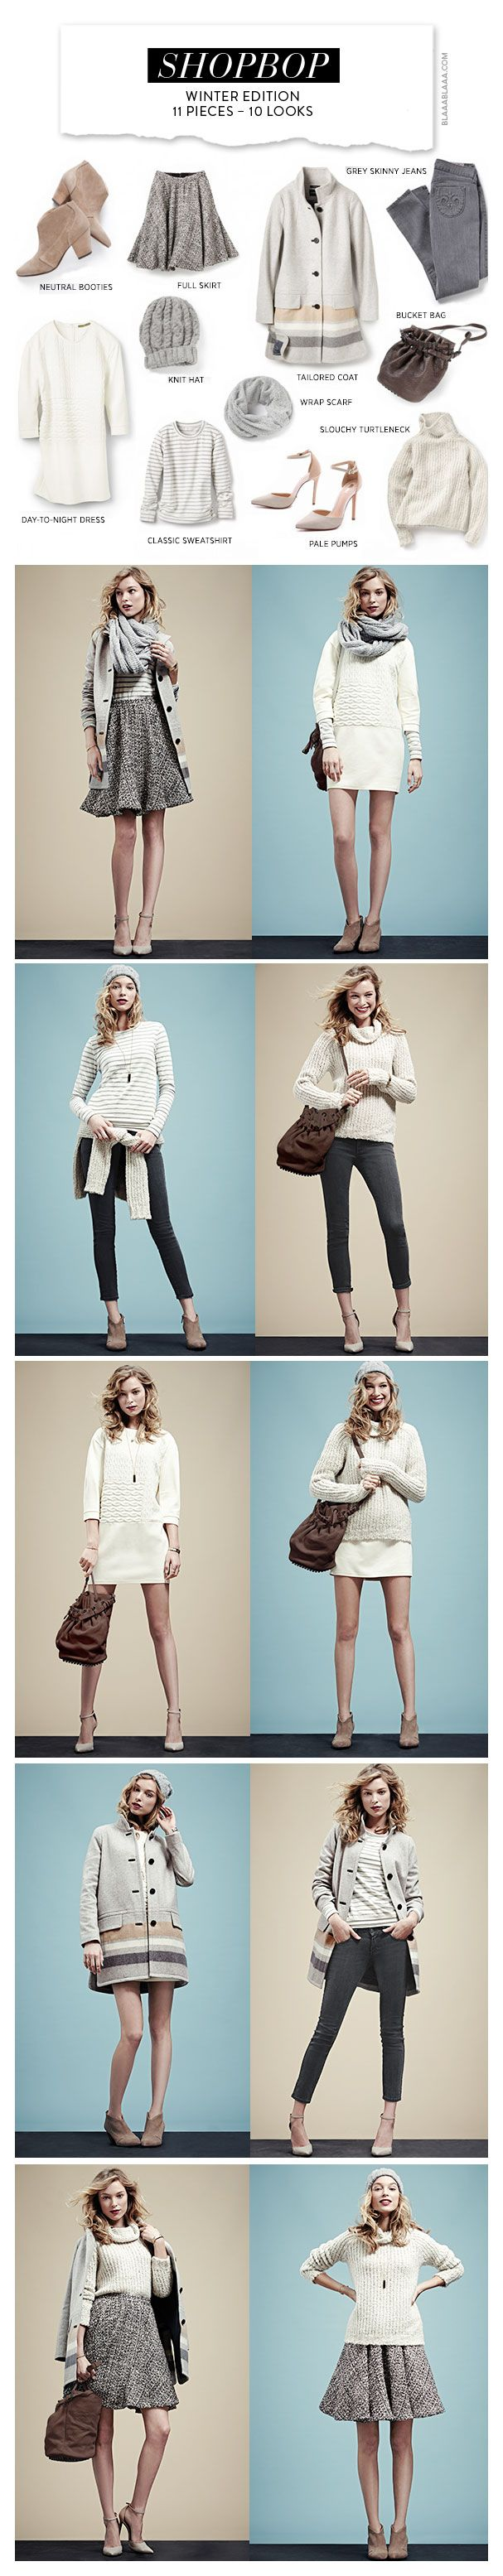 Shopbop Winter Edition 11 Pieces – 10 Looks